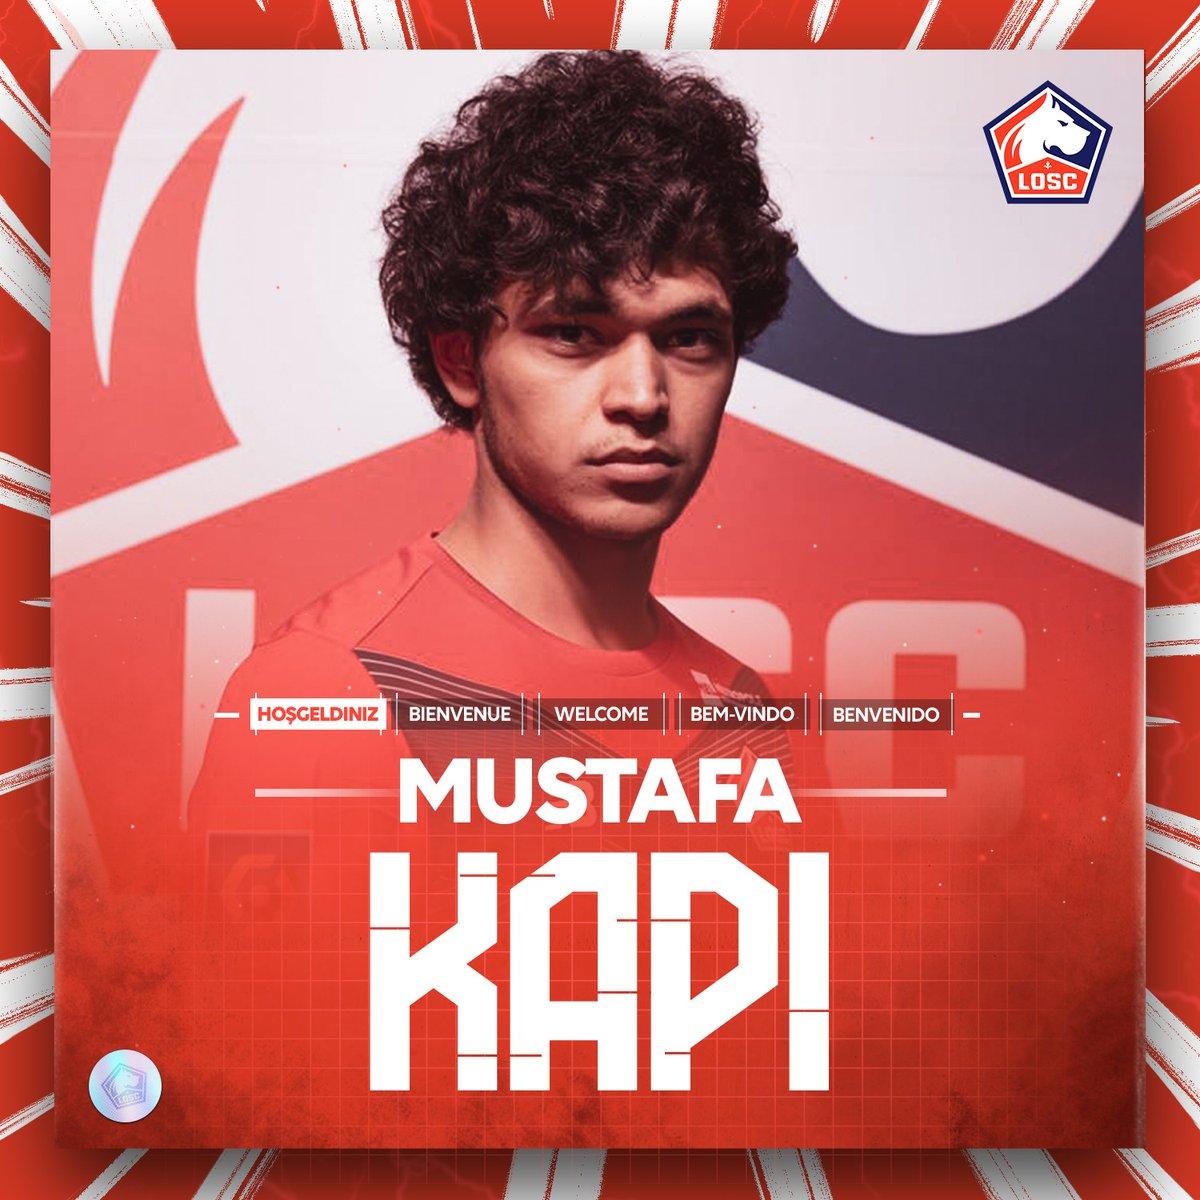 Mustafa Kapi